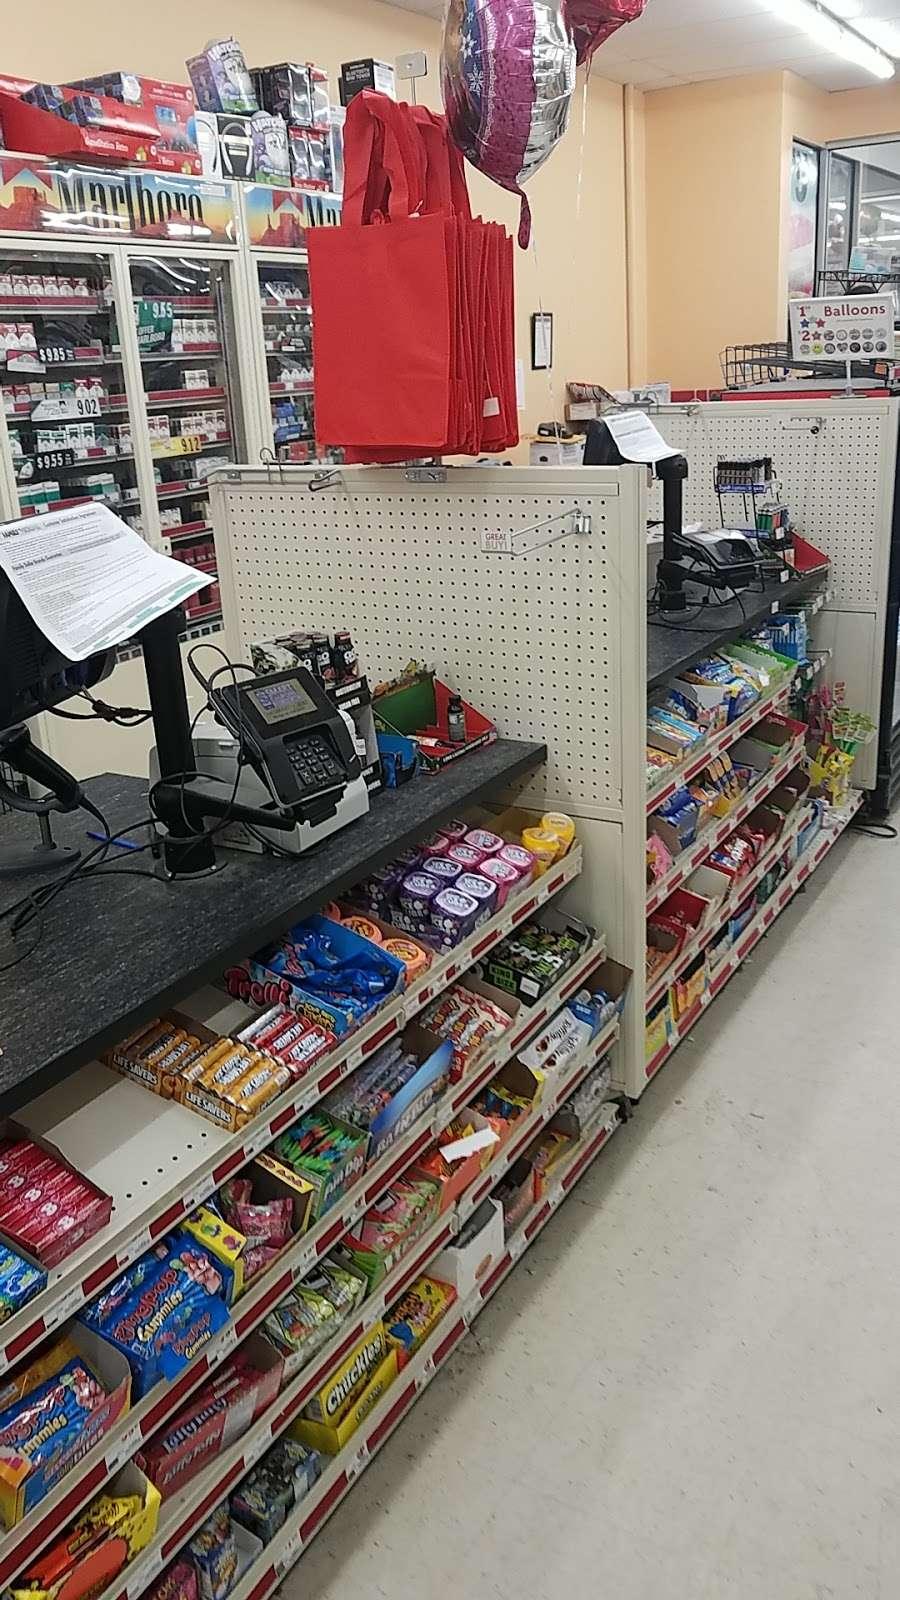 Family Dollar - supermarket  | Photo 2 of 10 | Address: 382 Warburton Ave, Yonkers, NY 10701, USA | Phone: (914) 356-8442